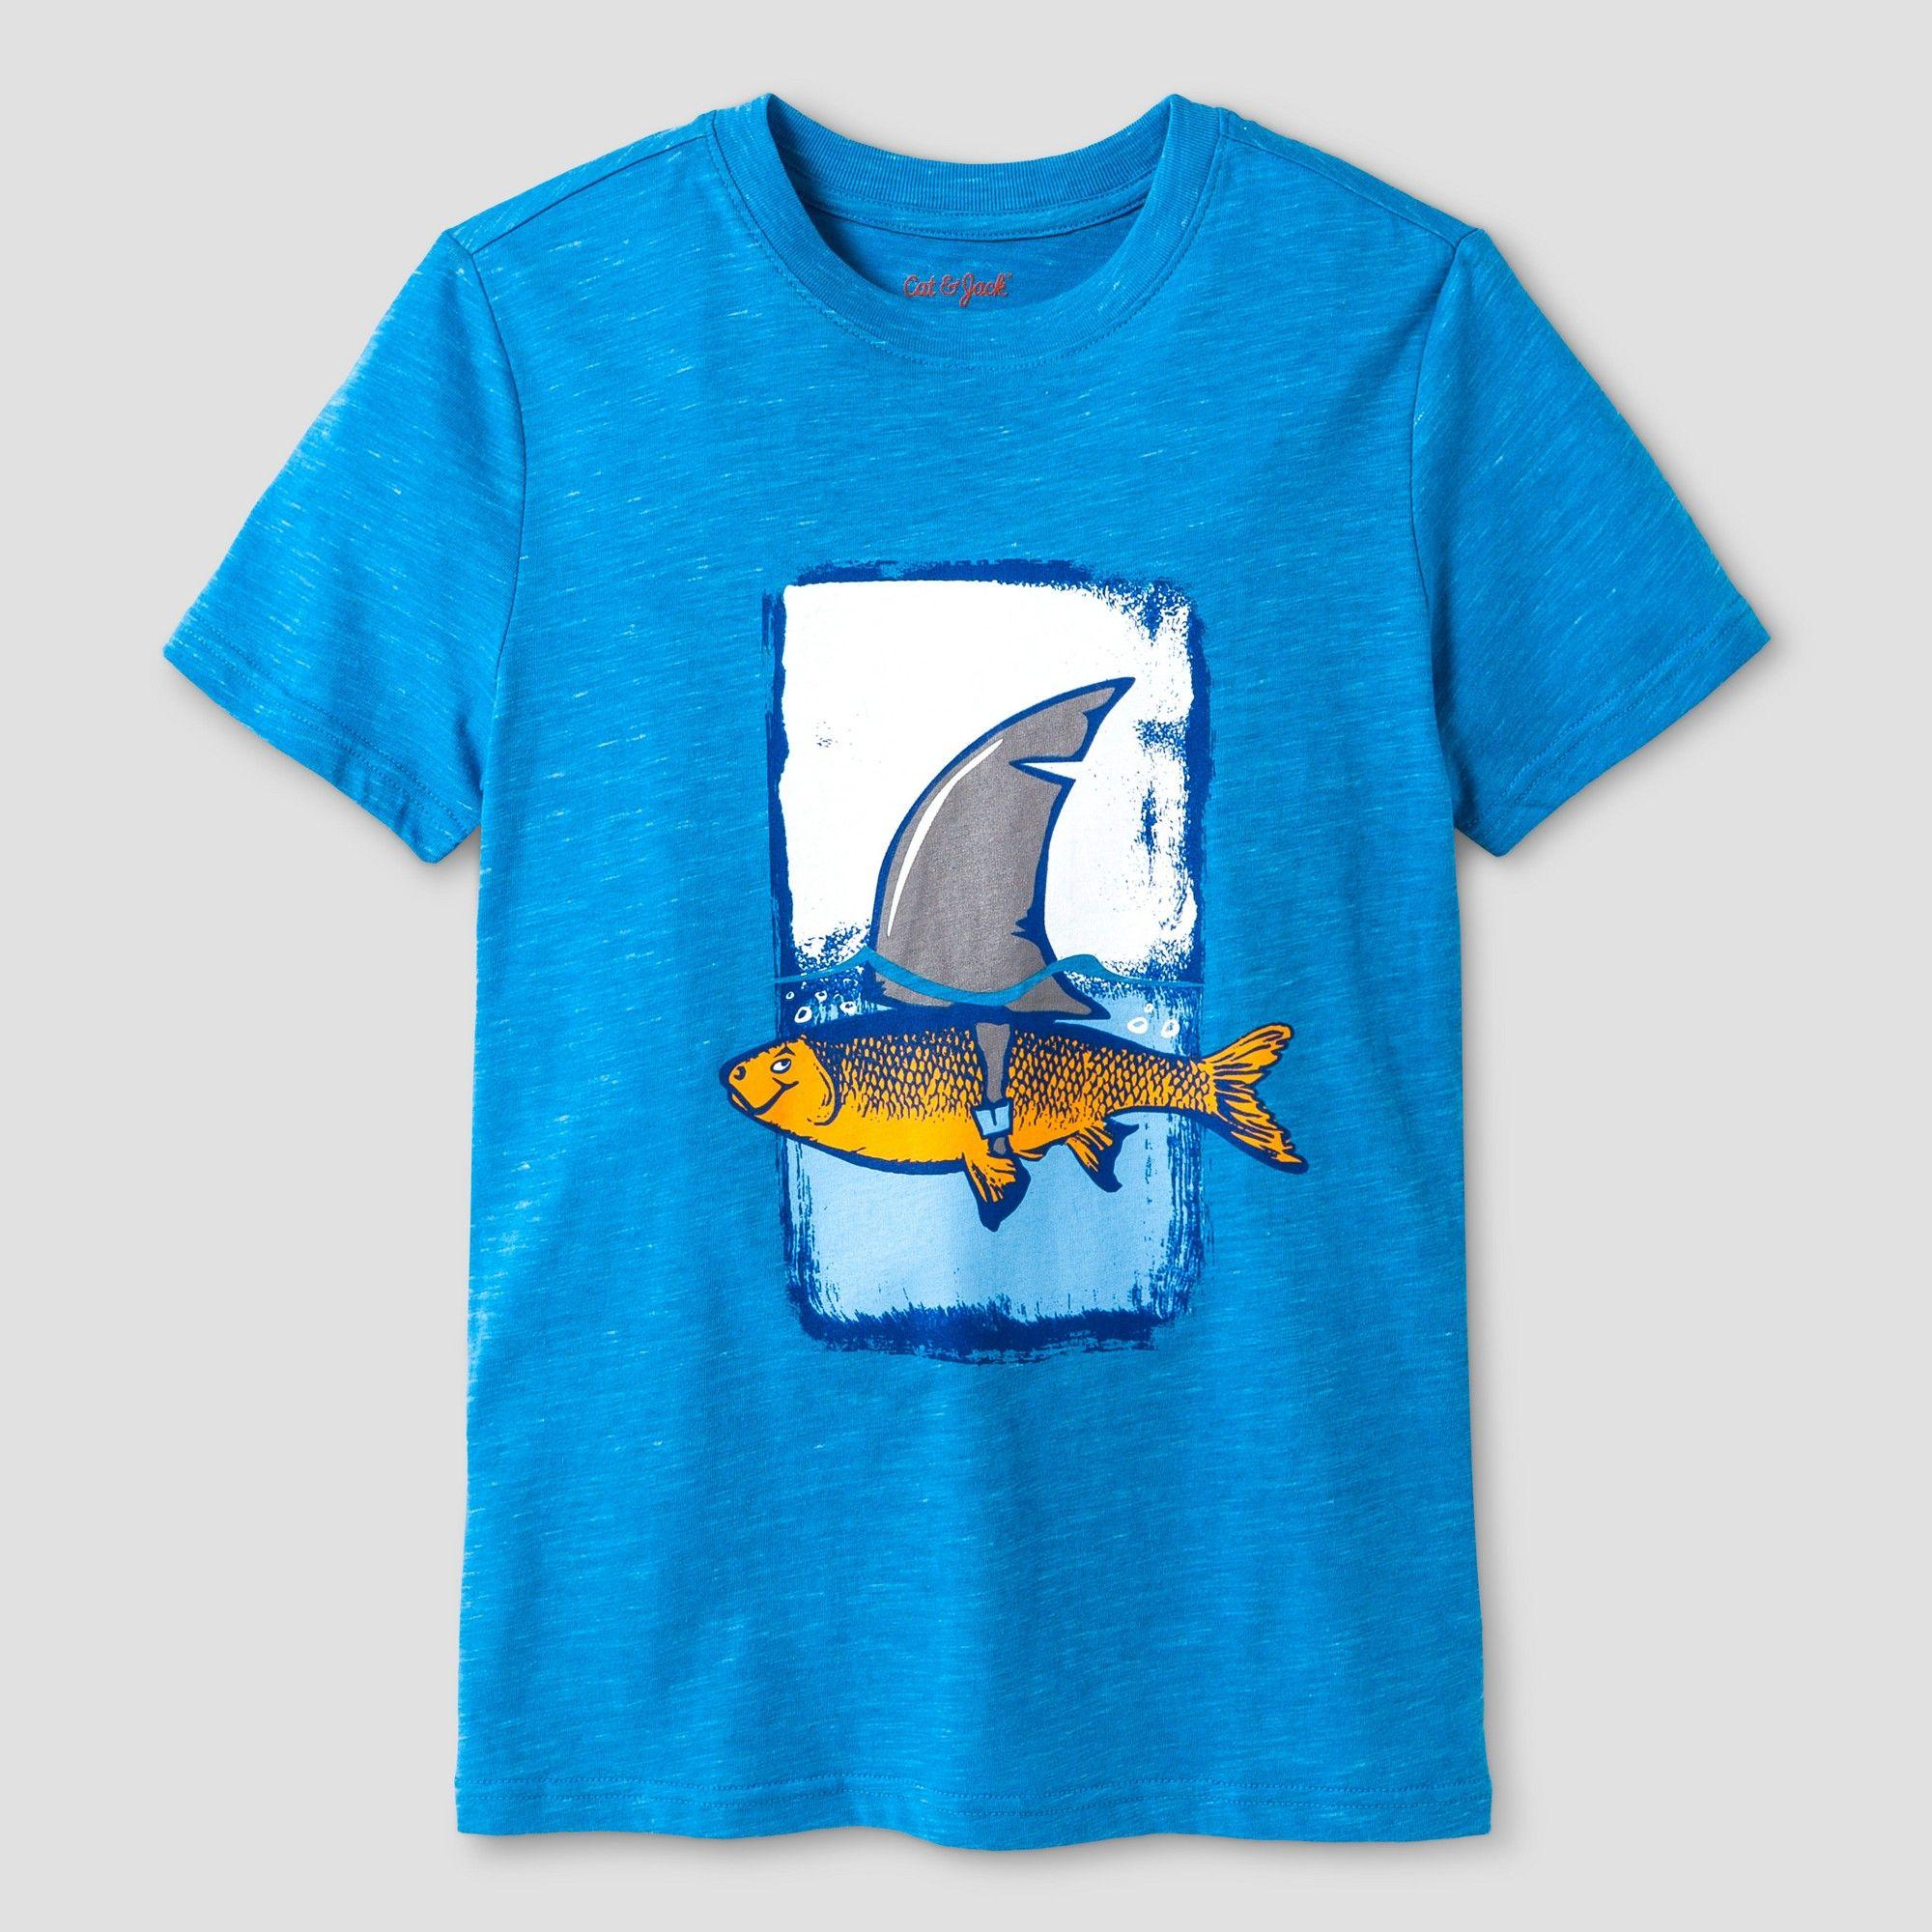 Boys' Fish Shark Graphic Short Sleeve TShirt Cat & Jack